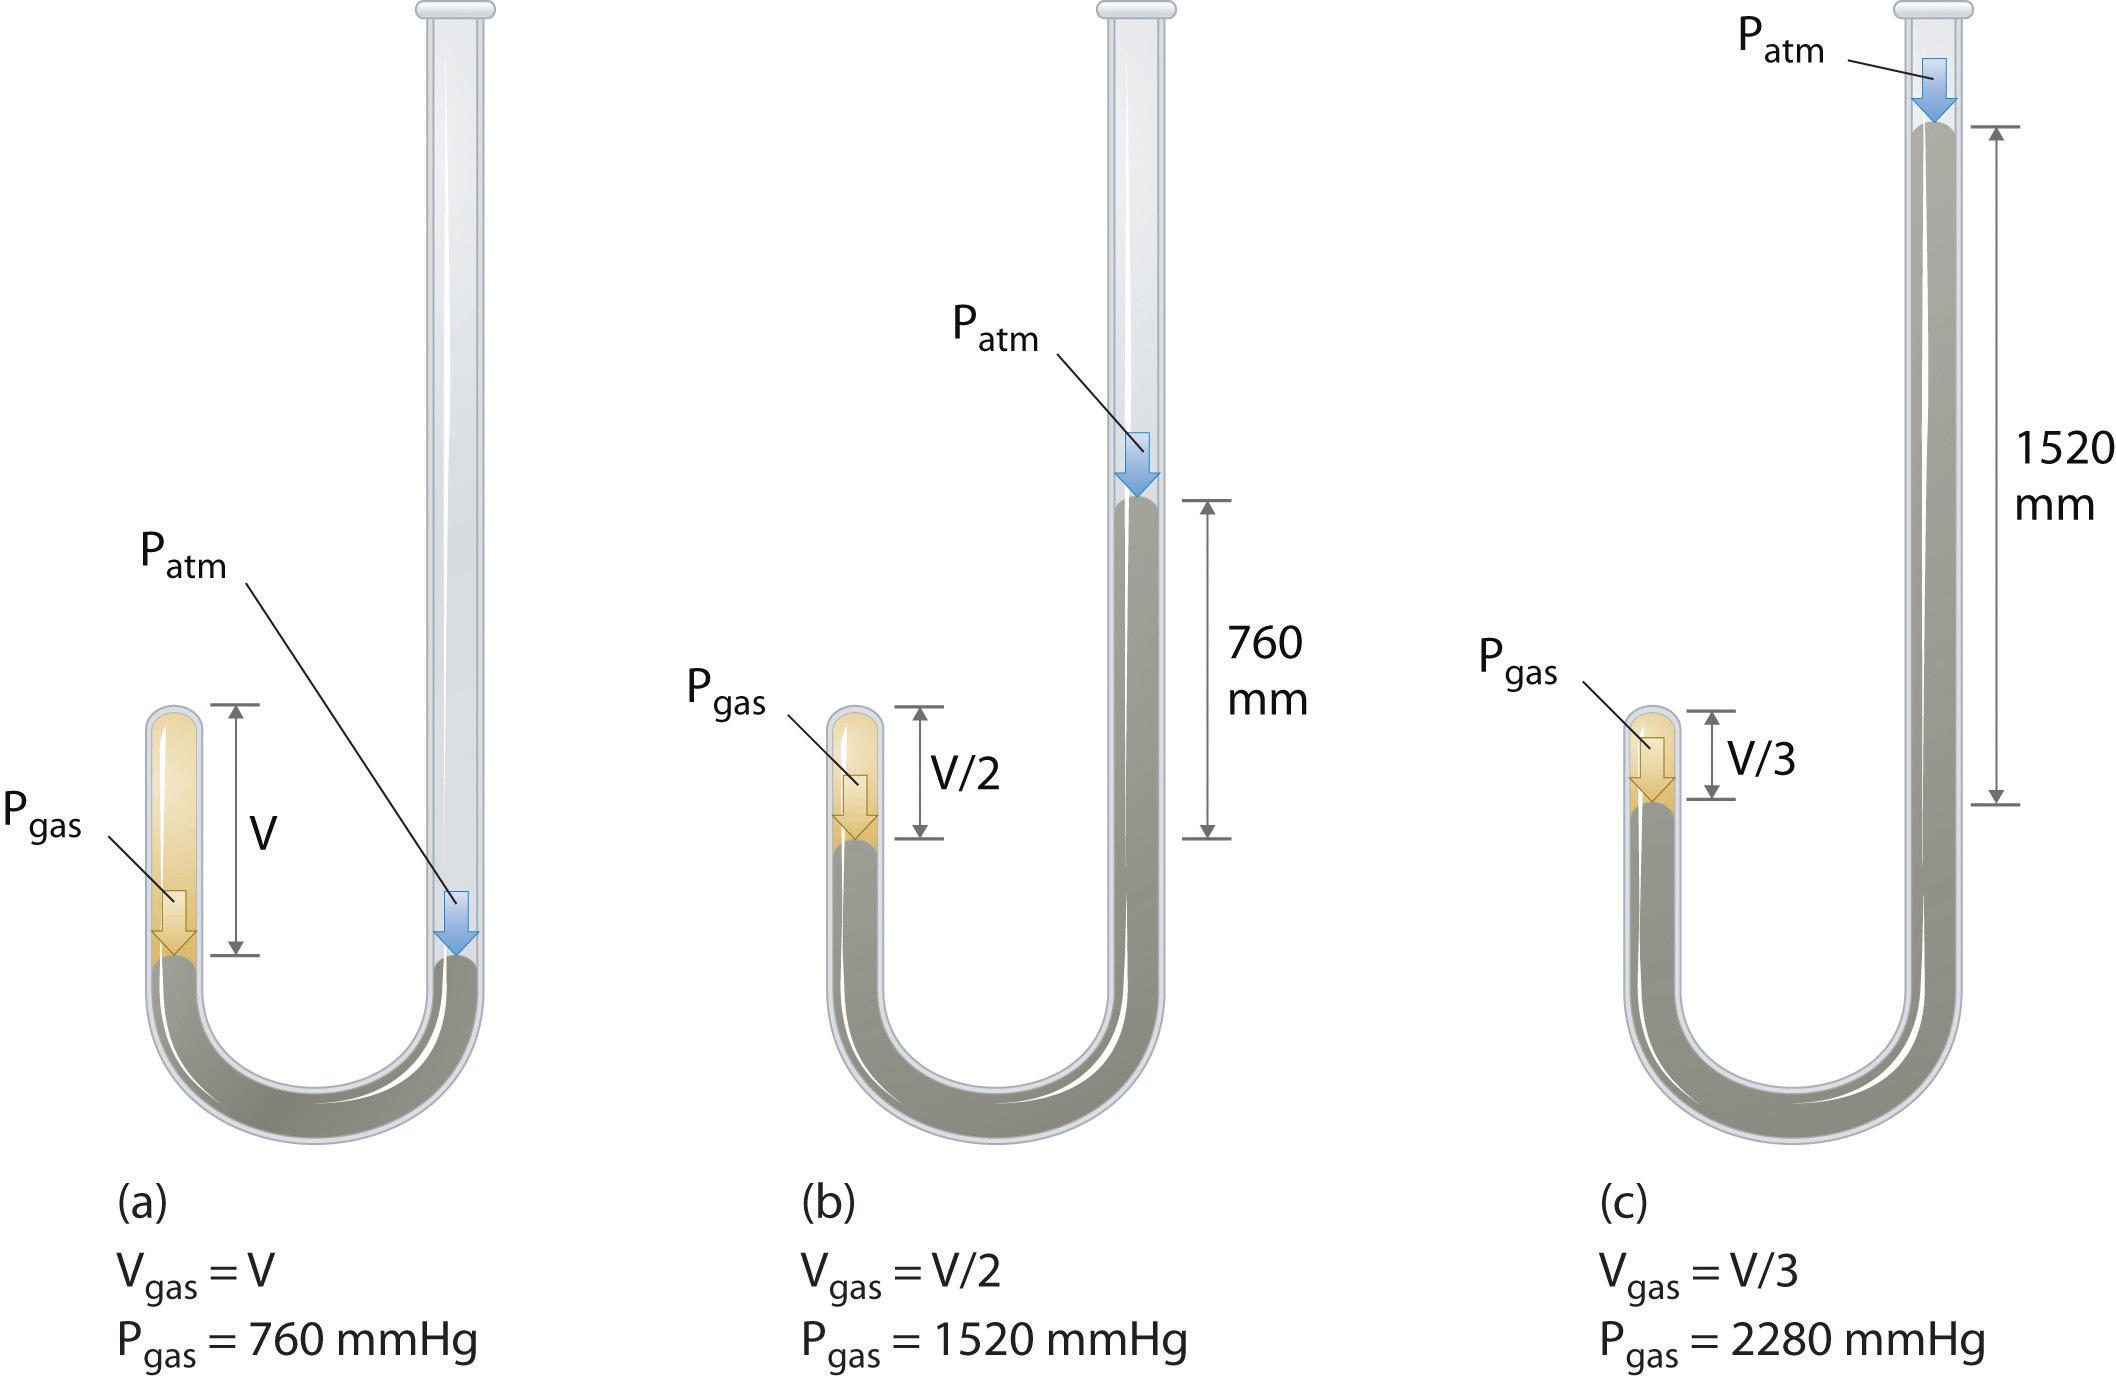 lab 11 boyles law Boyle's law lab kiwi playz loading  boyle's law (gas laws)  11 boyle's law demonstrations - duration:.